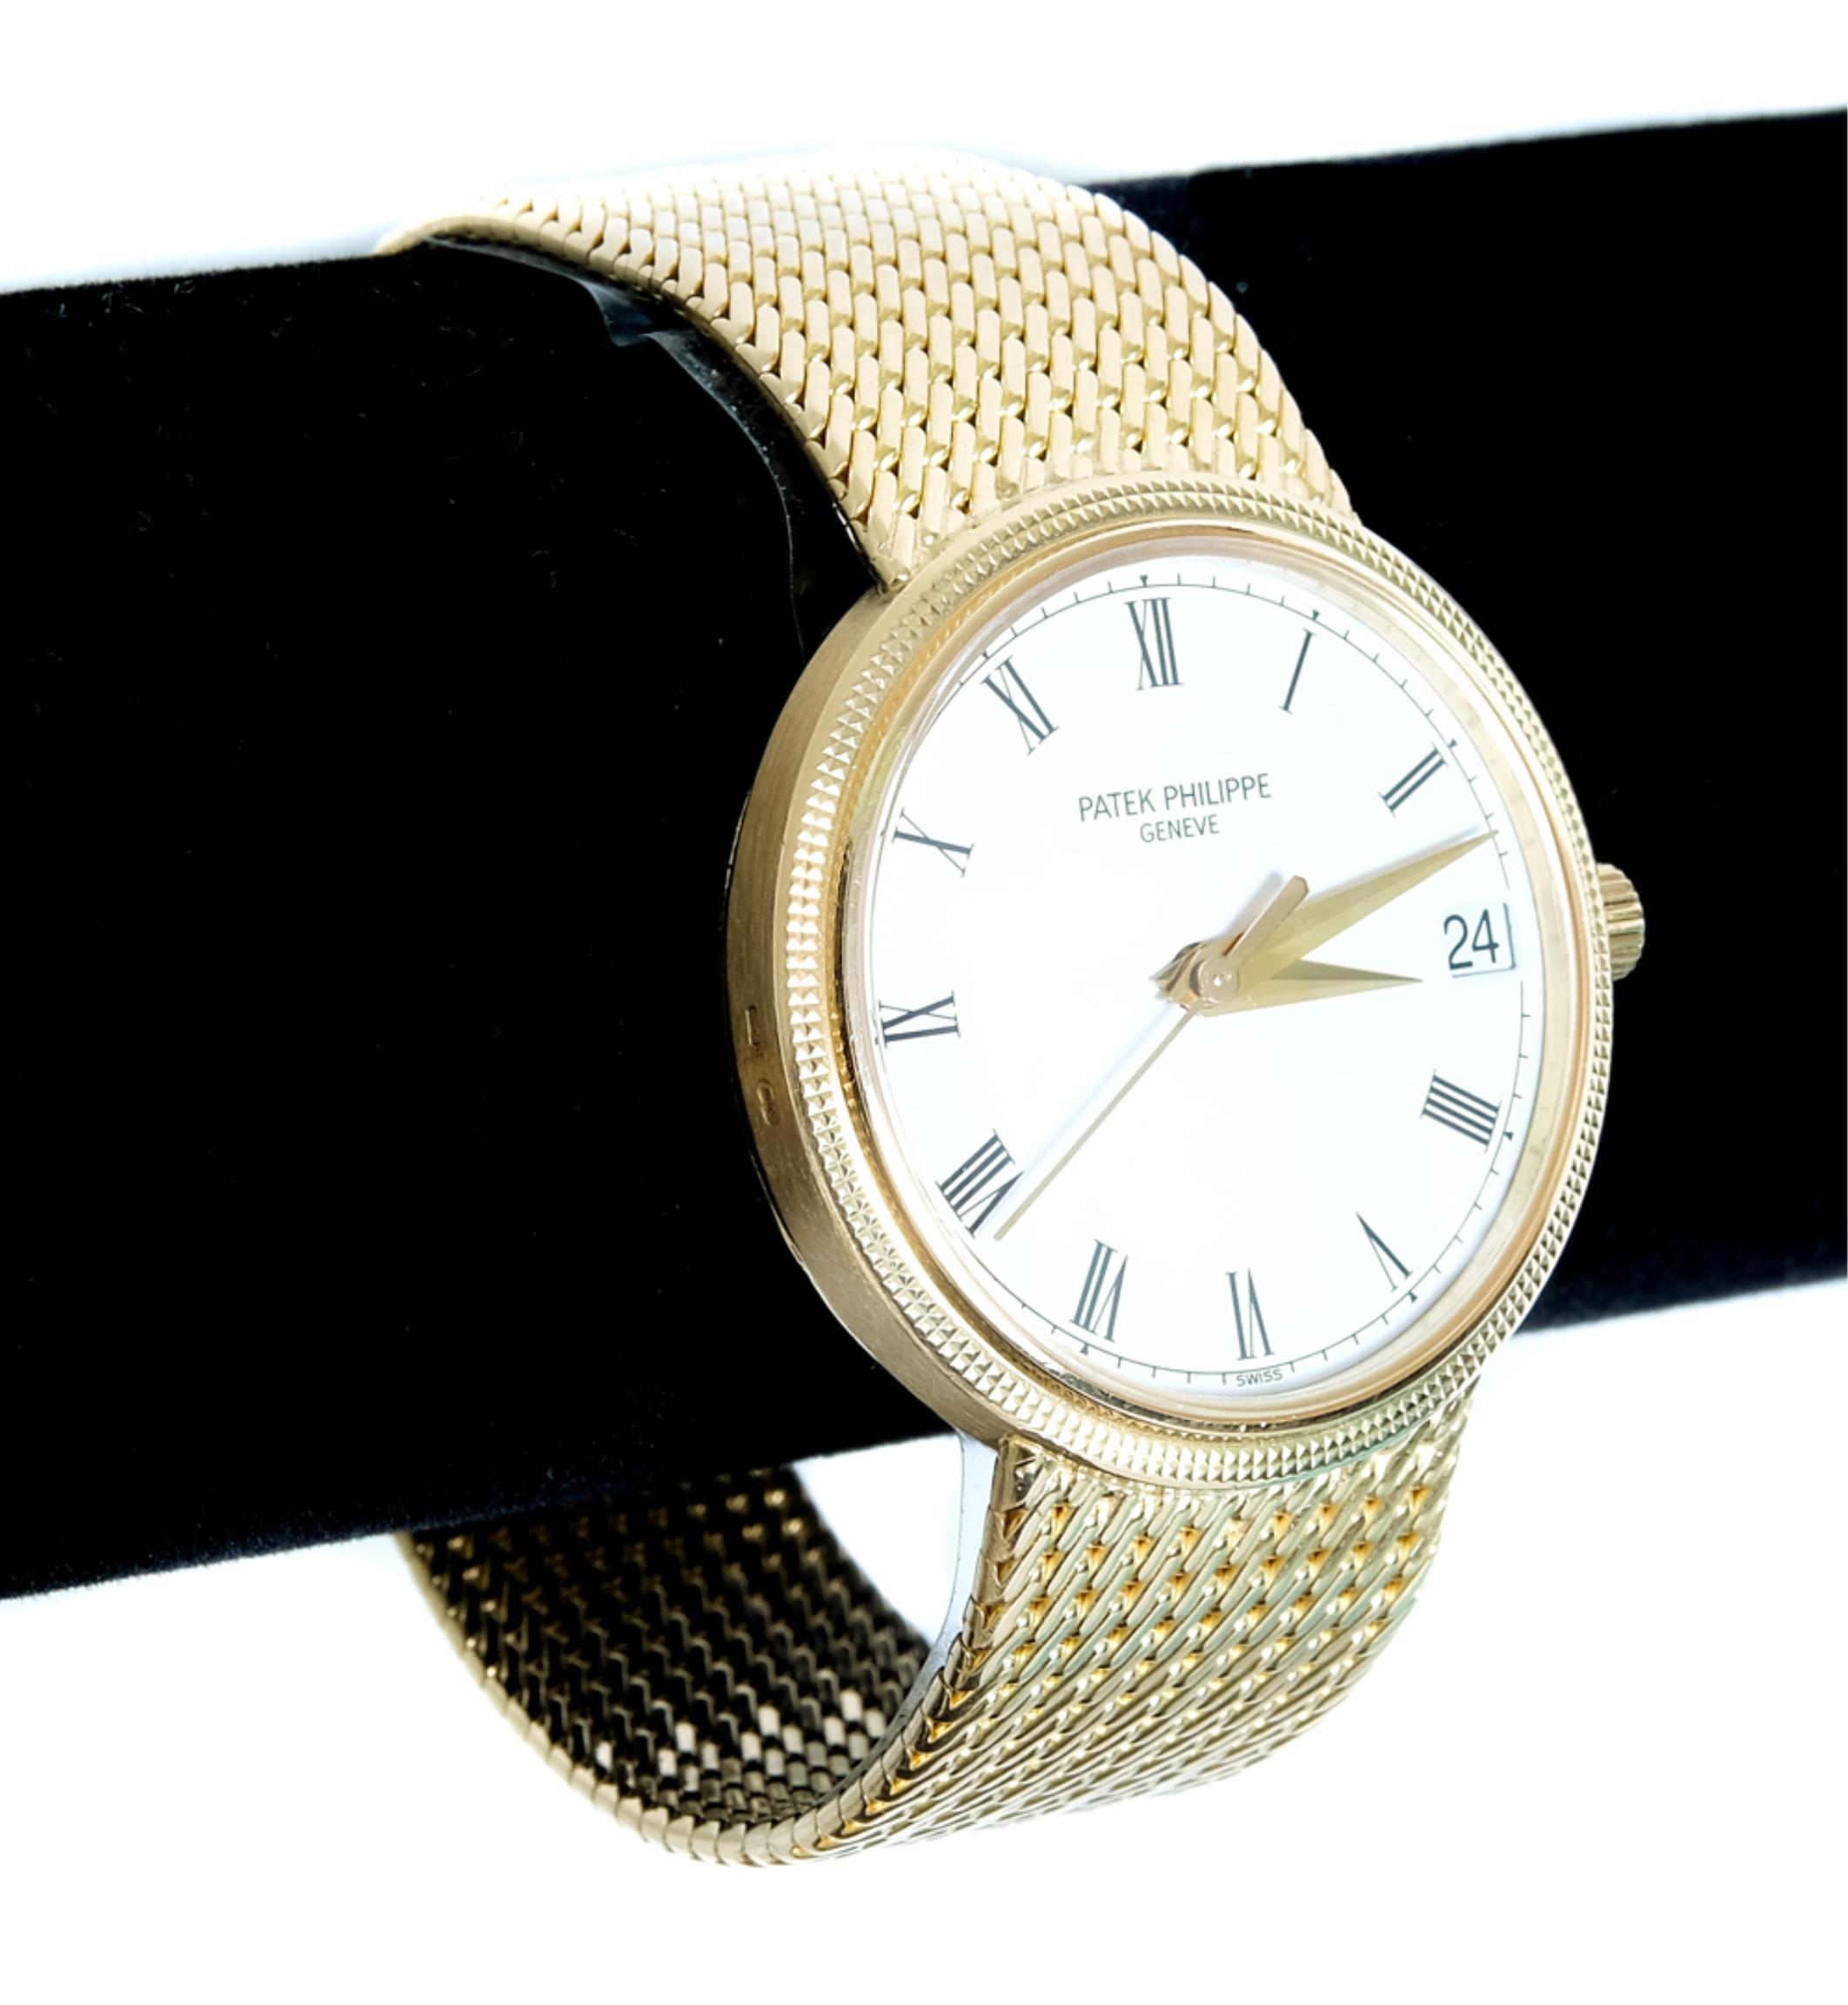 Patek Philippe 18K YG Automatic Watch w/Date